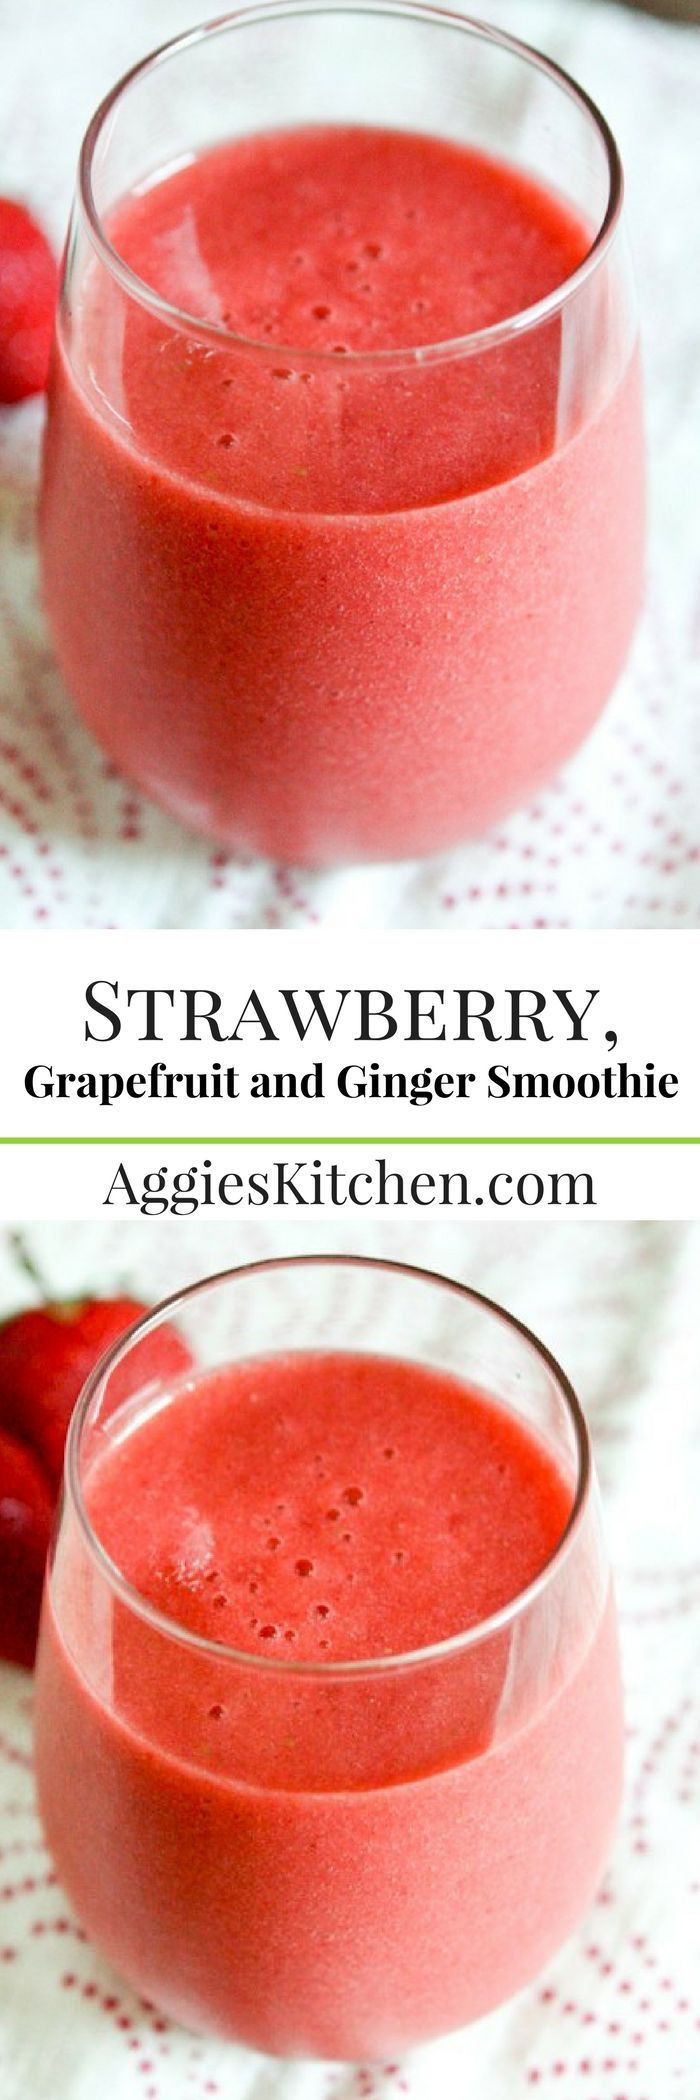 Strawberry, Grapefruit and Ginger Smoothie | Recipe | Smoothie ...